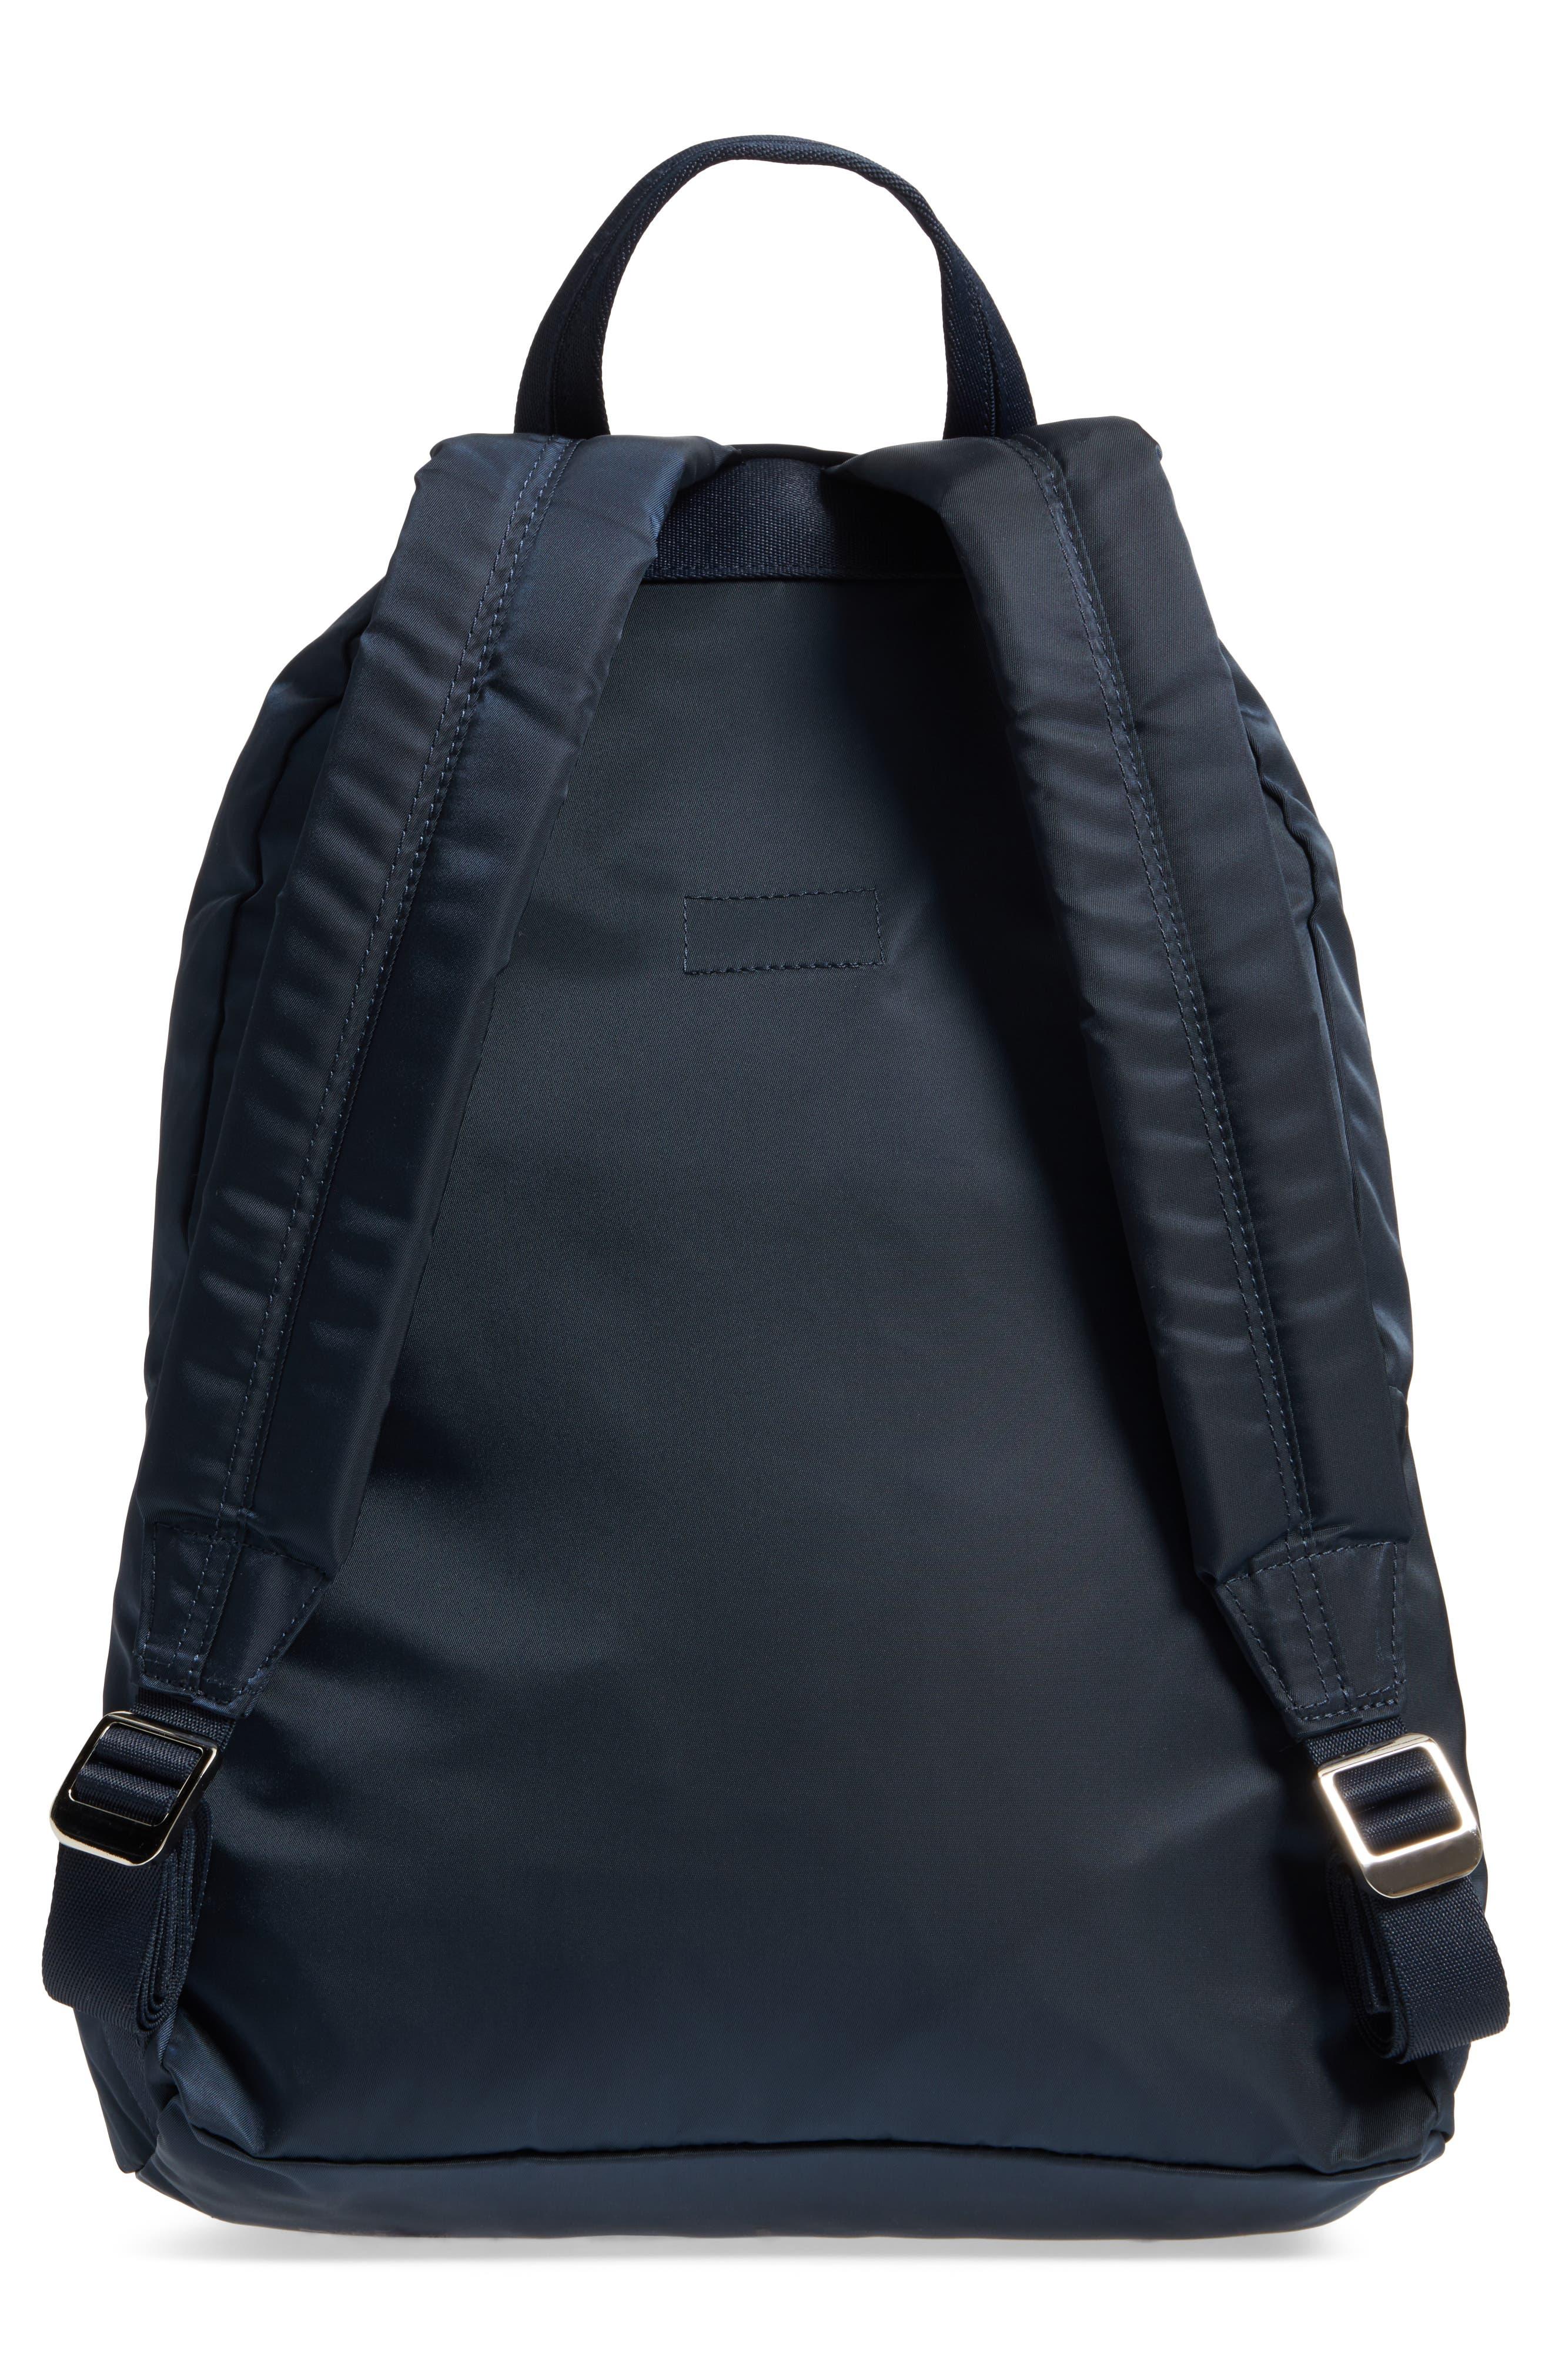 Porter-Yoshida & Co. Daily Backpack,                             Alternate thumbnail 3, color,                             Navy